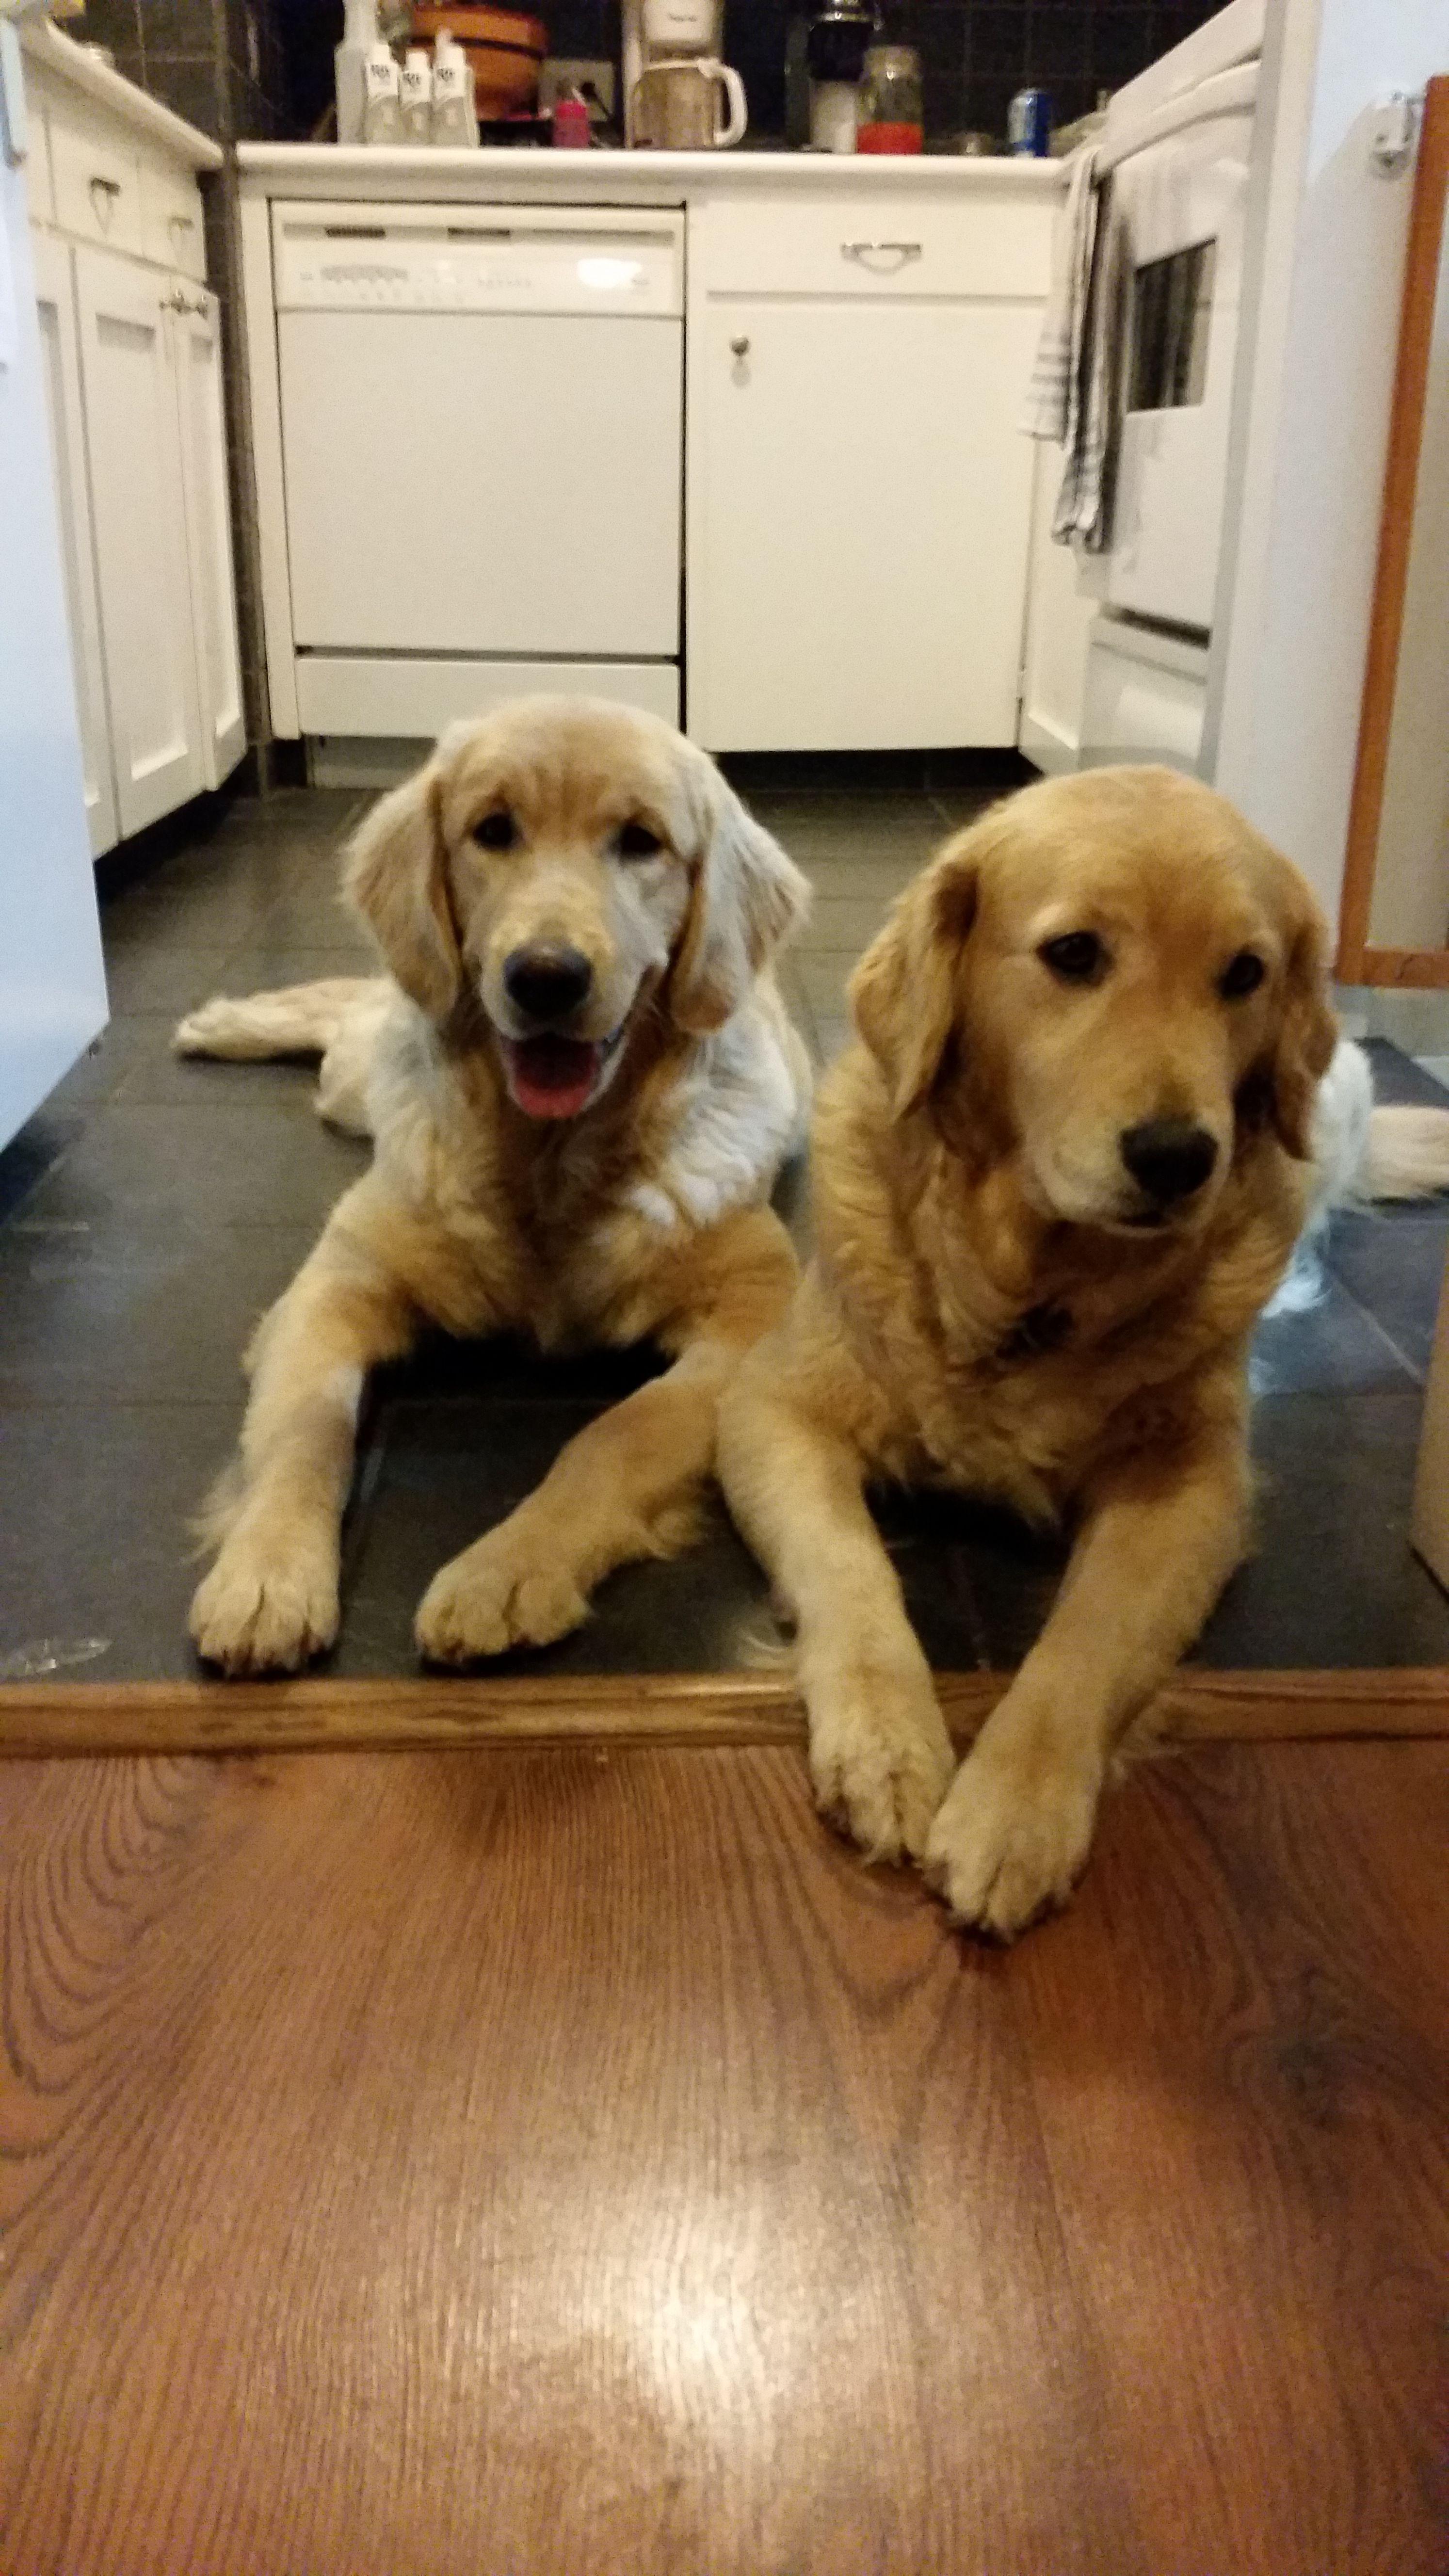 Nola Golden Retriever Pawshake Golden Retriever Dogs And